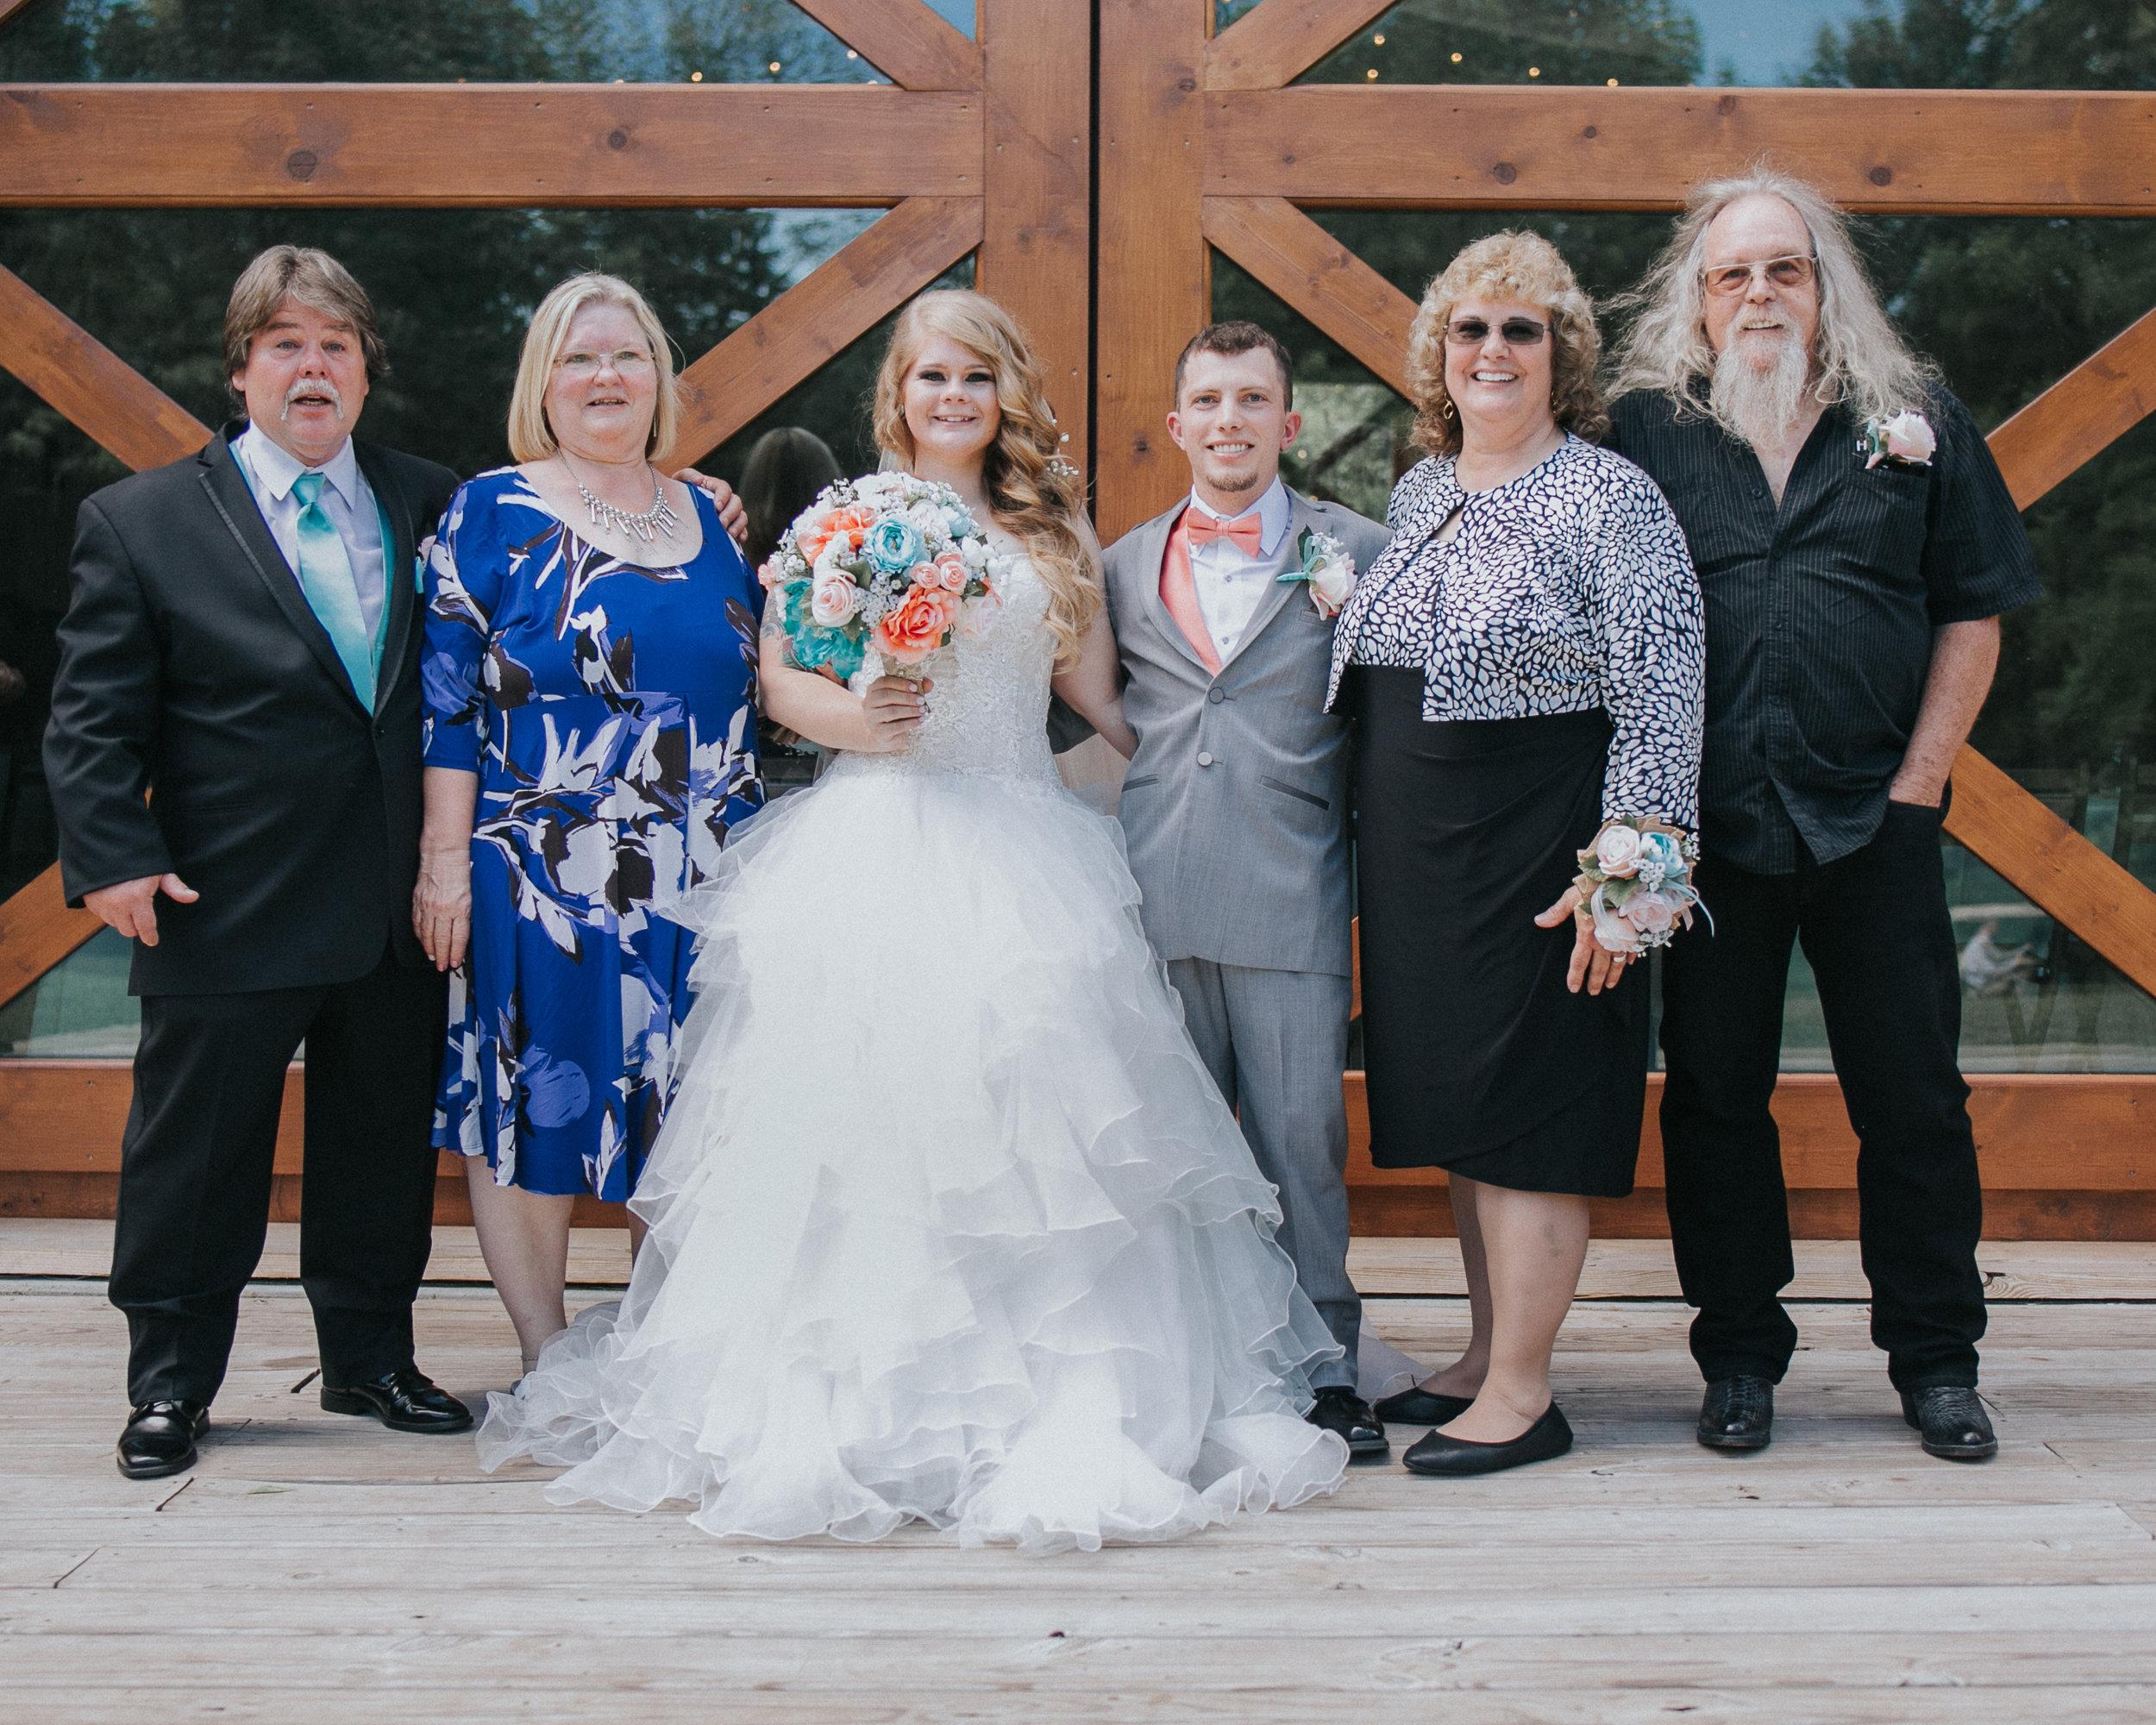 McDaniel Wedding 2017-794.jpg